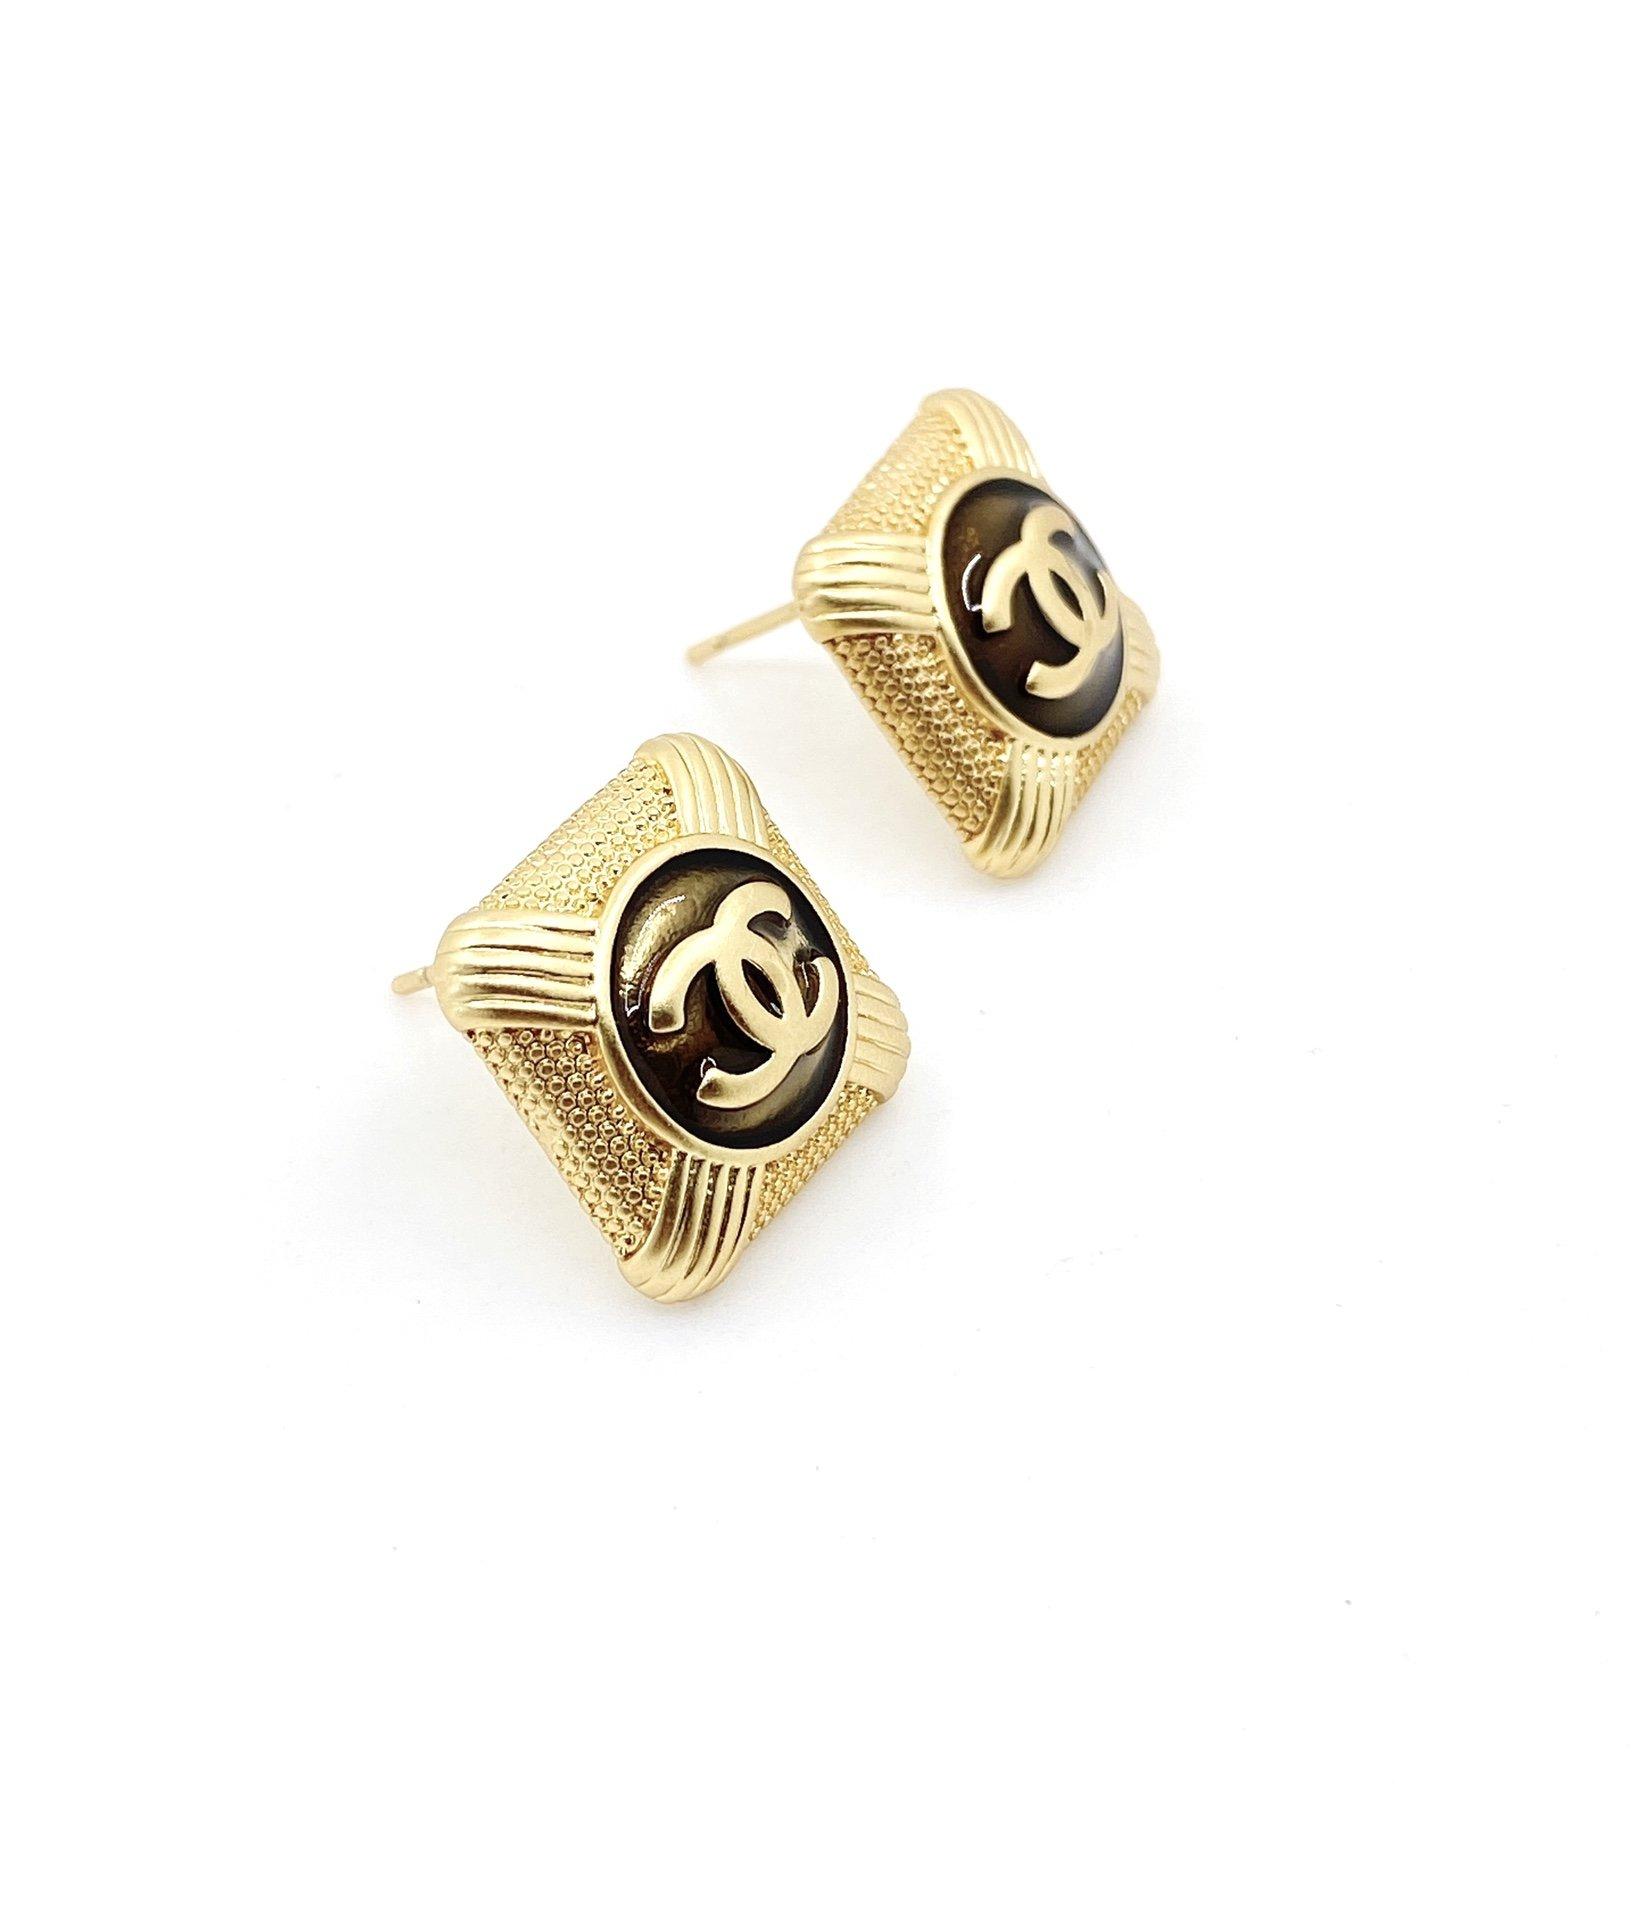 Chanel最新款方形黑耳环一致zP